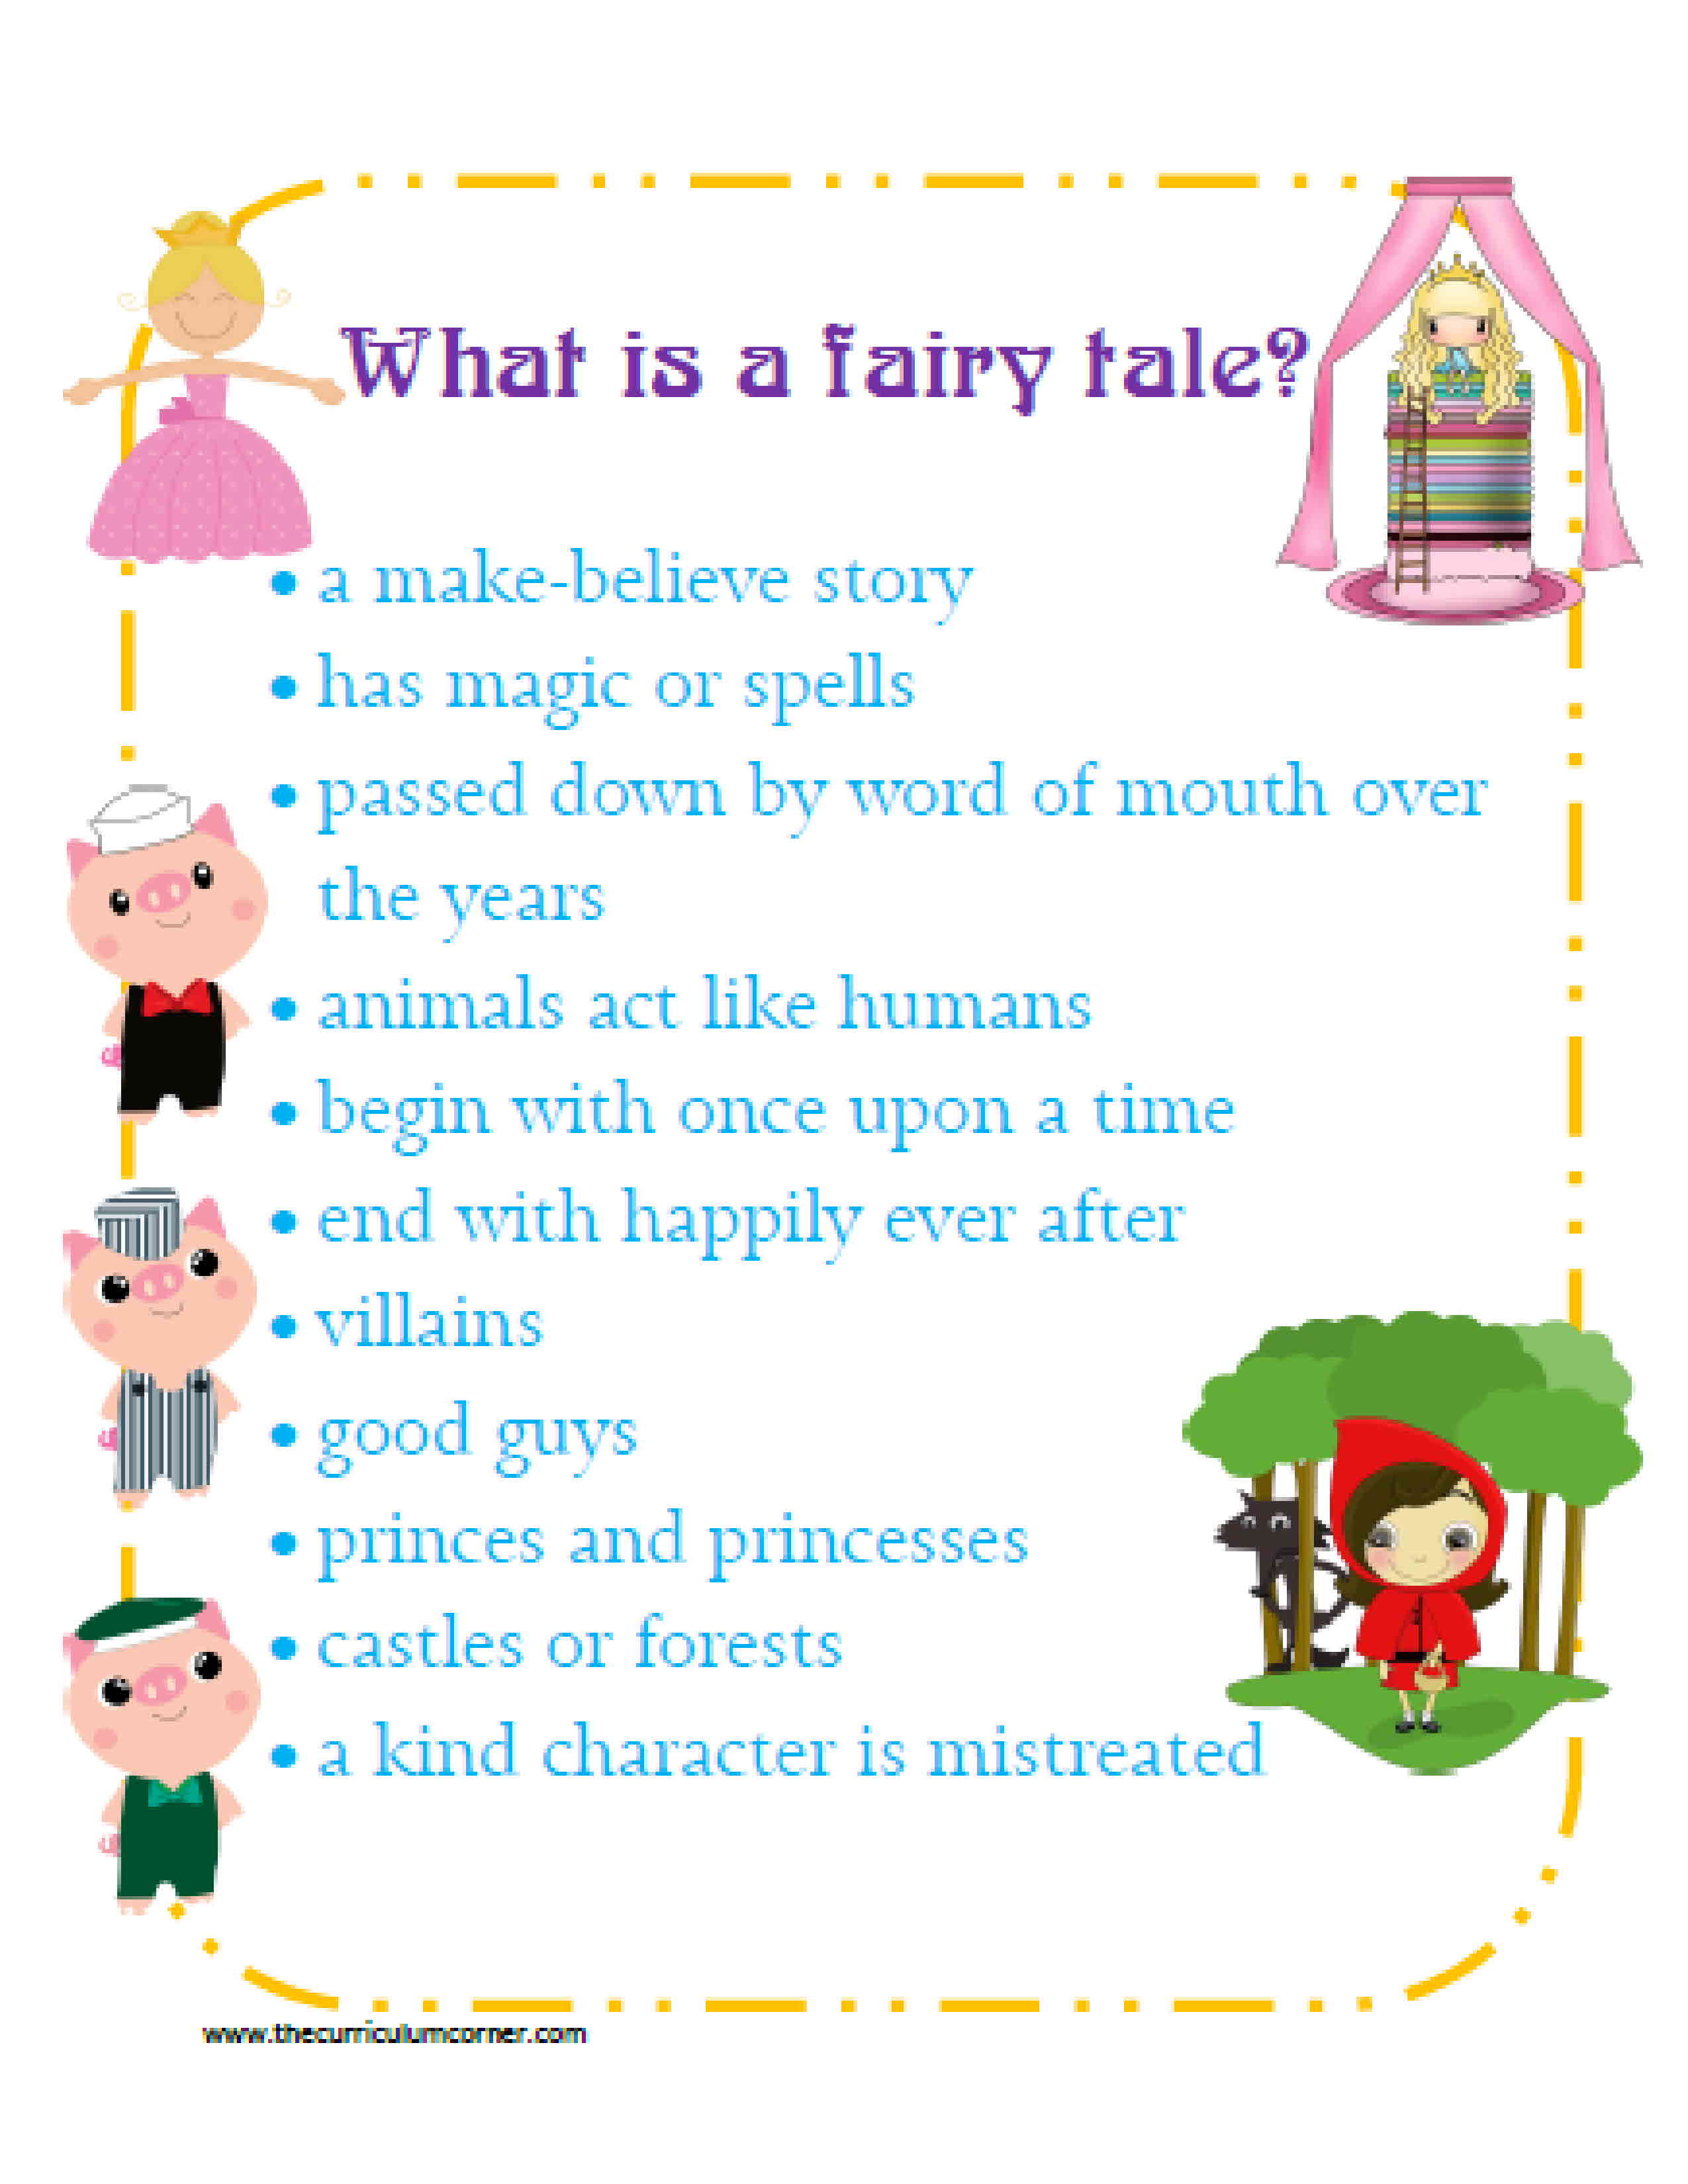 Characteristics of a folktale